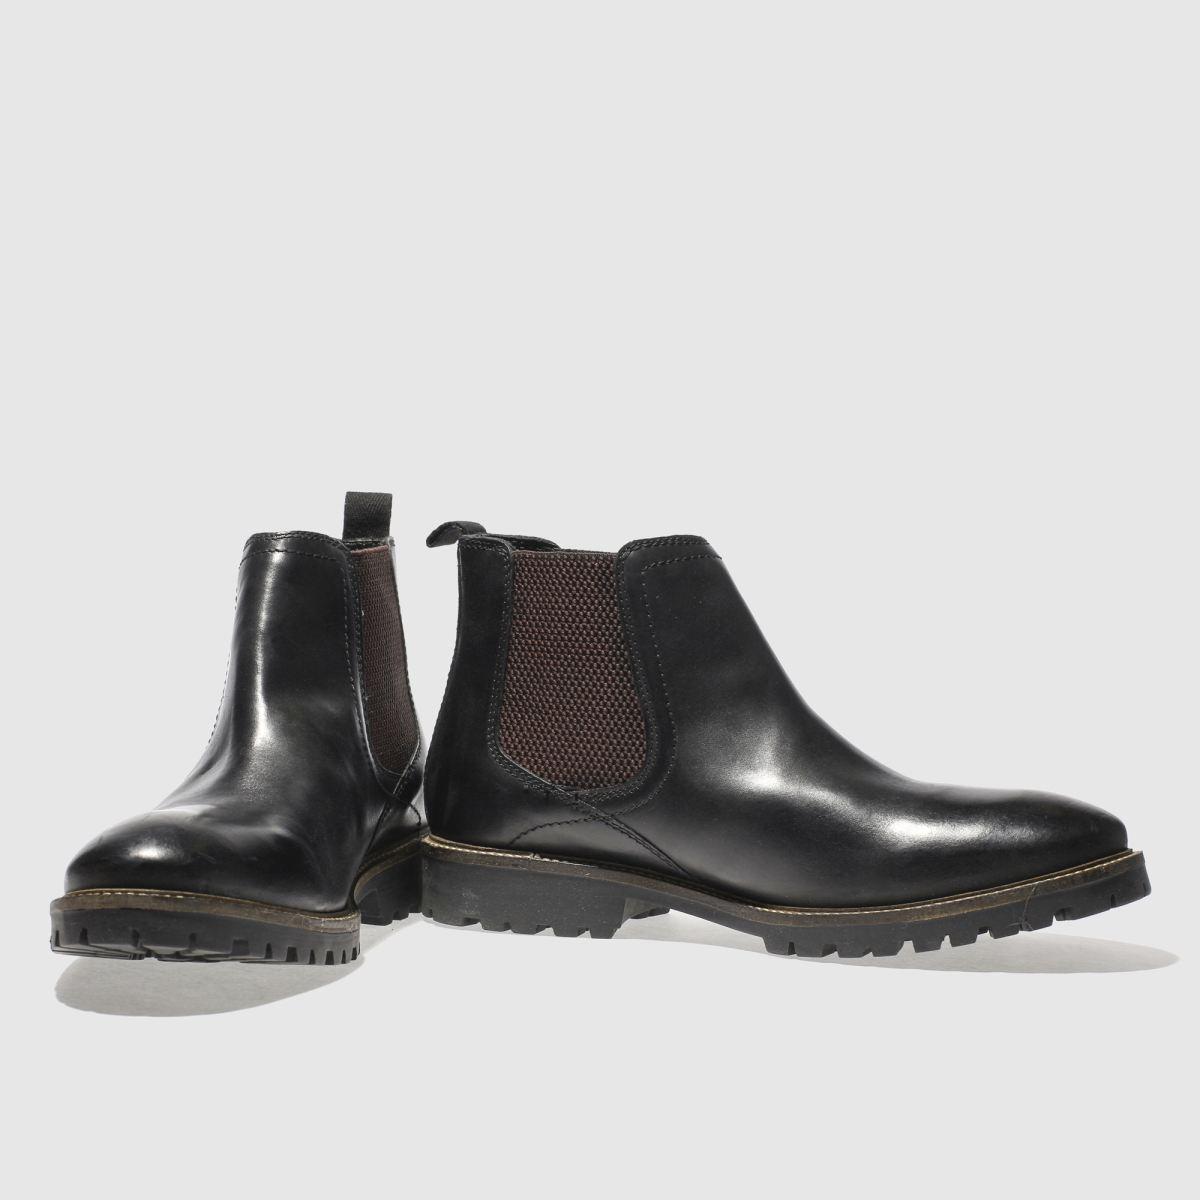 Herren Schwarz ikon Duster Chelsea Boots | schuh Gute Qualität beliebte Schuhe